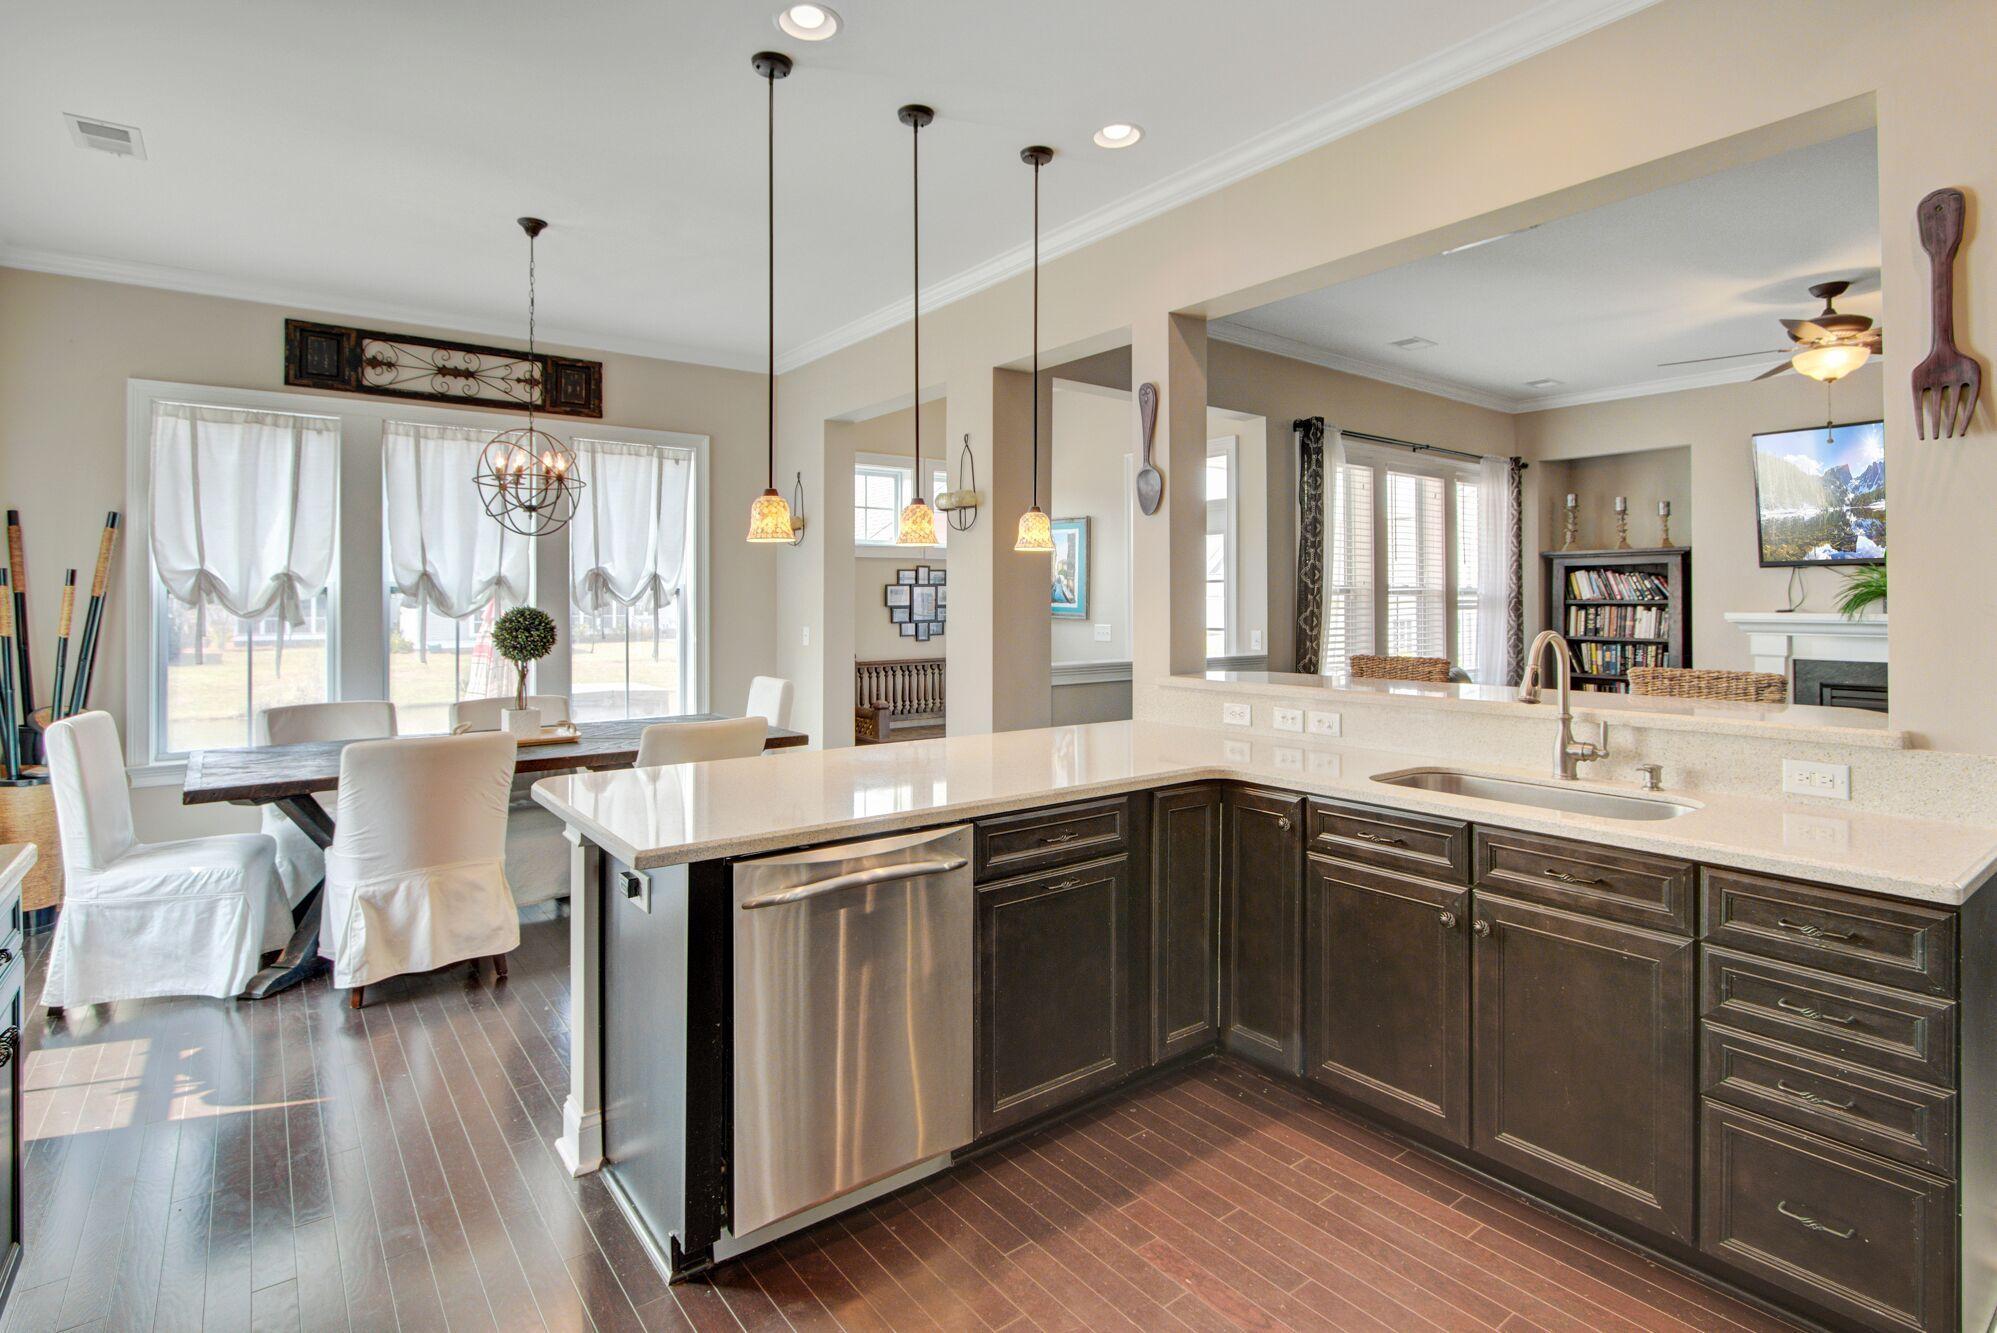 Carolina Park Homes For Sale - 3614 Shutesbury, Mount Pleasant, SC - 27